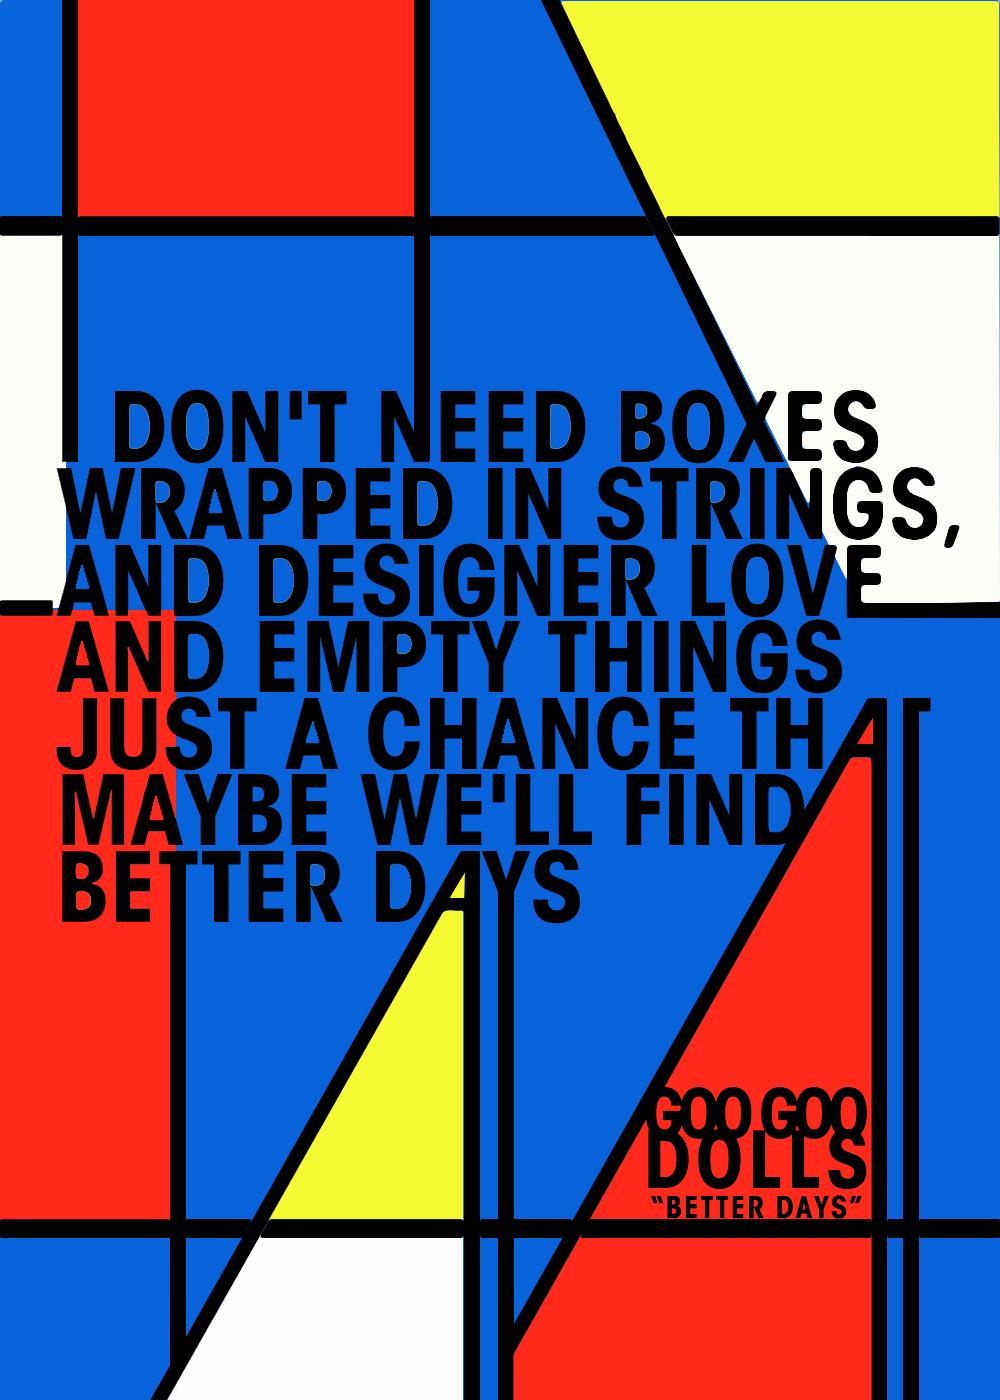 """Better days"" - Goo Goo Dolls #lyrics #music #betterdays #googoodolls   Goo goo dolls, Music ..."